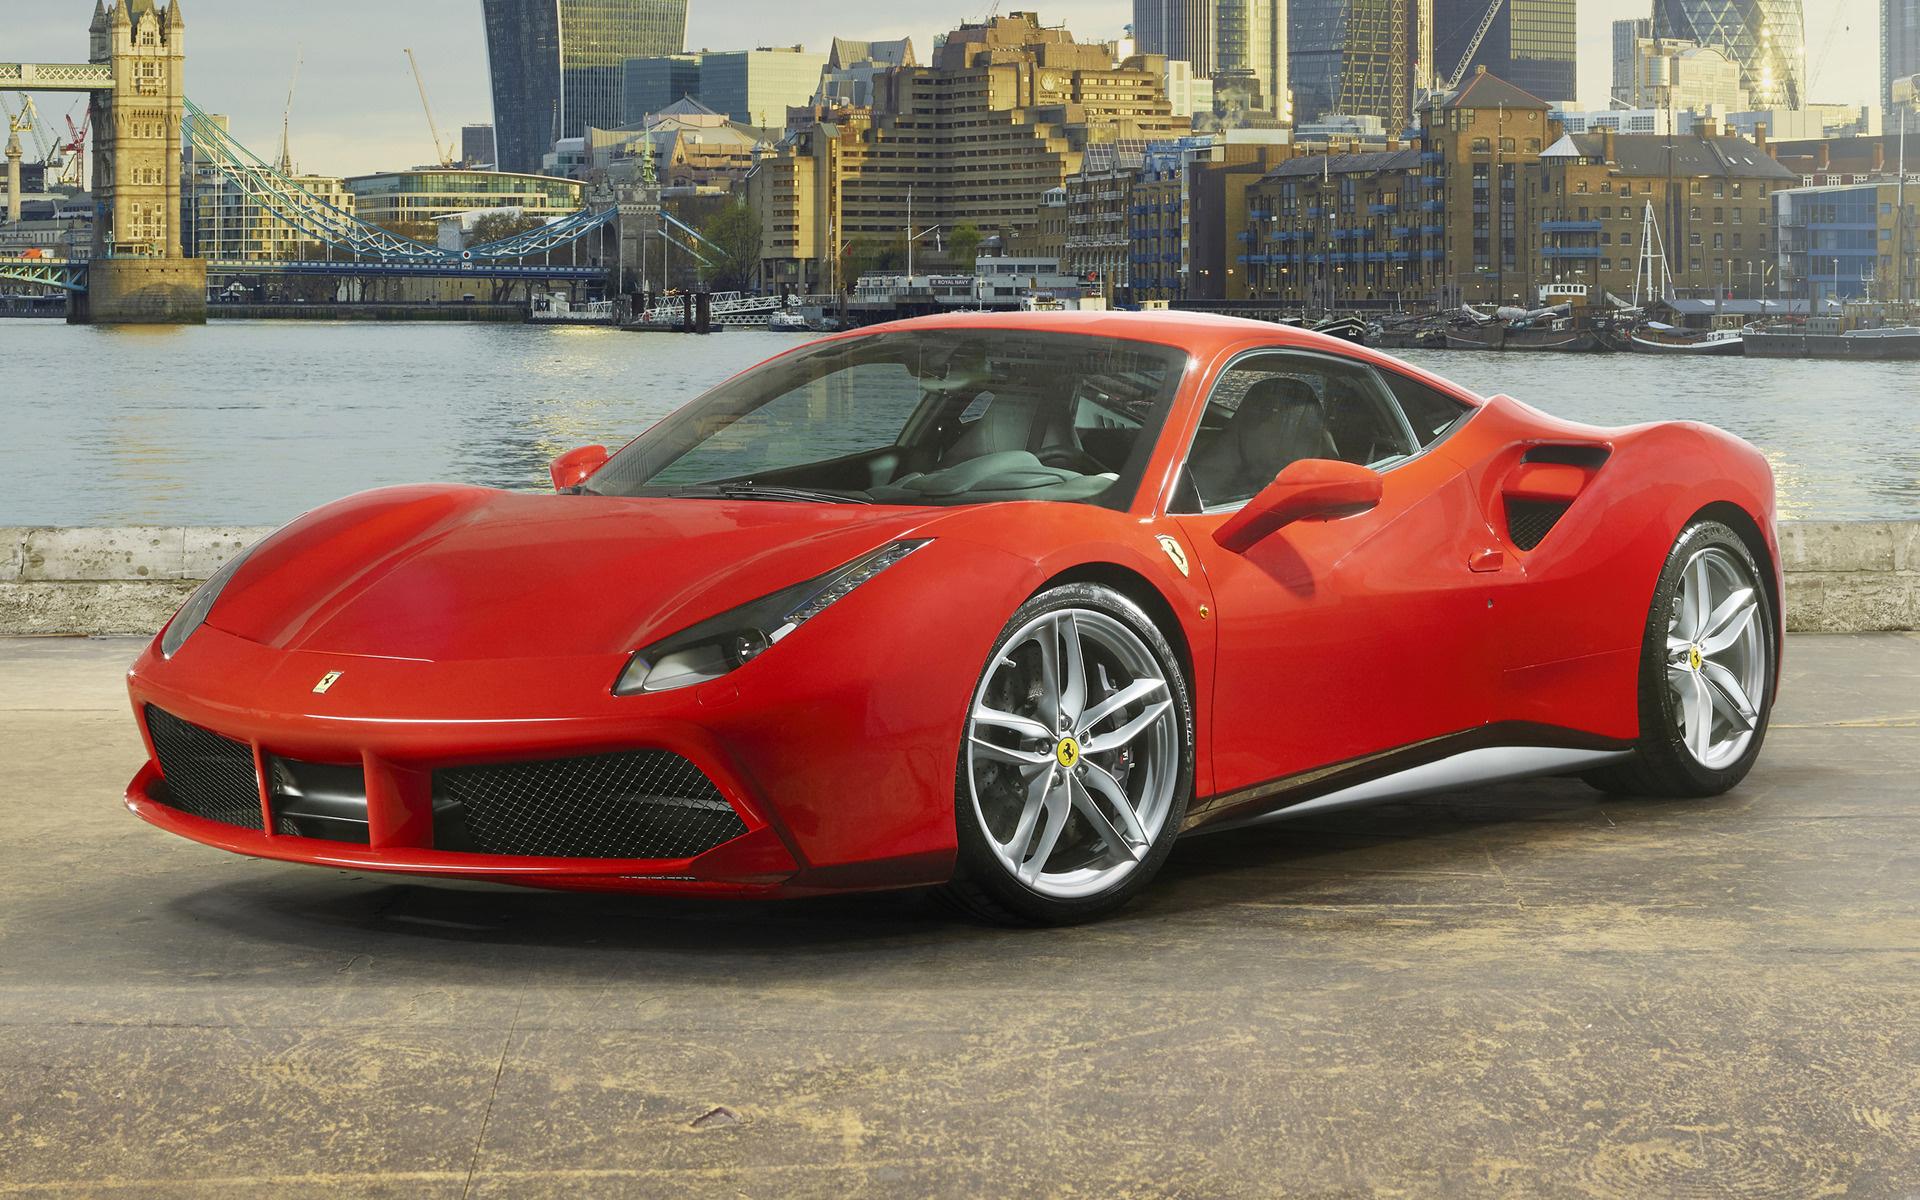 All Car Wallpapers Hd Ferrari 488 Gtb 2015 Wallpapers And Hd Images Car Pixel